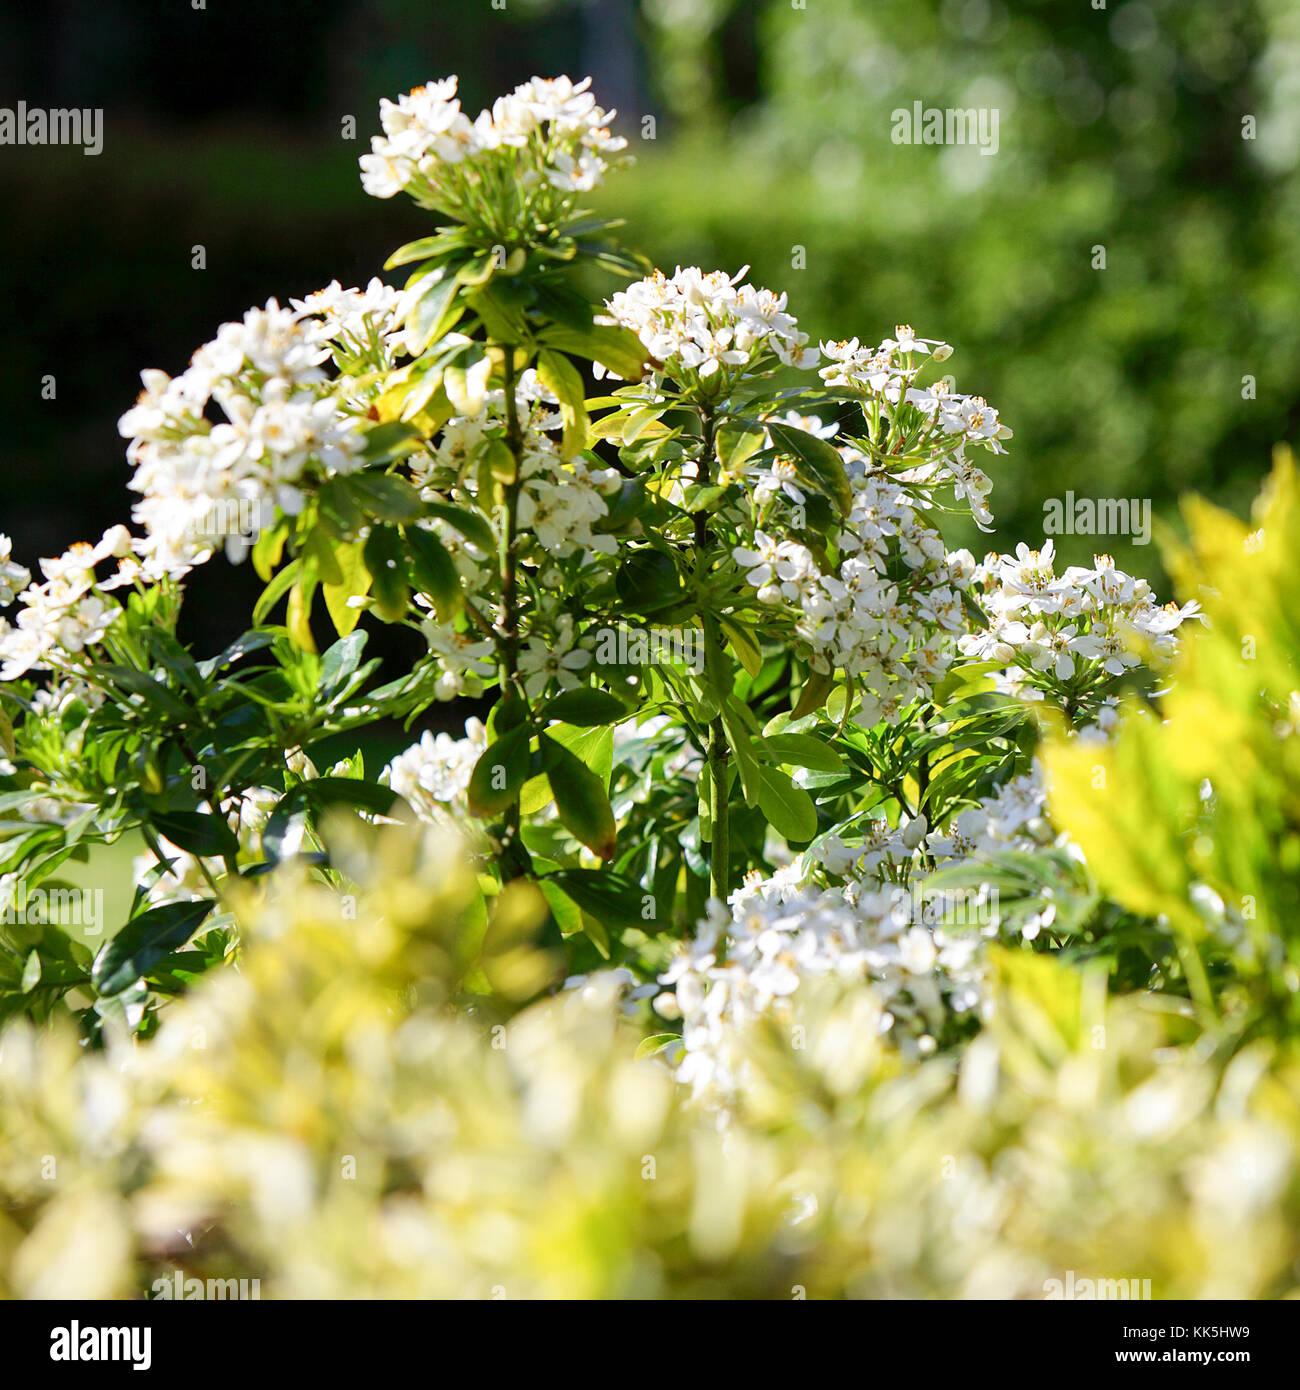 White flowering plants bathed in glorious summer sunshine in Acton Burnell, Shrewsbury, Shropshire, England. - Stock Image